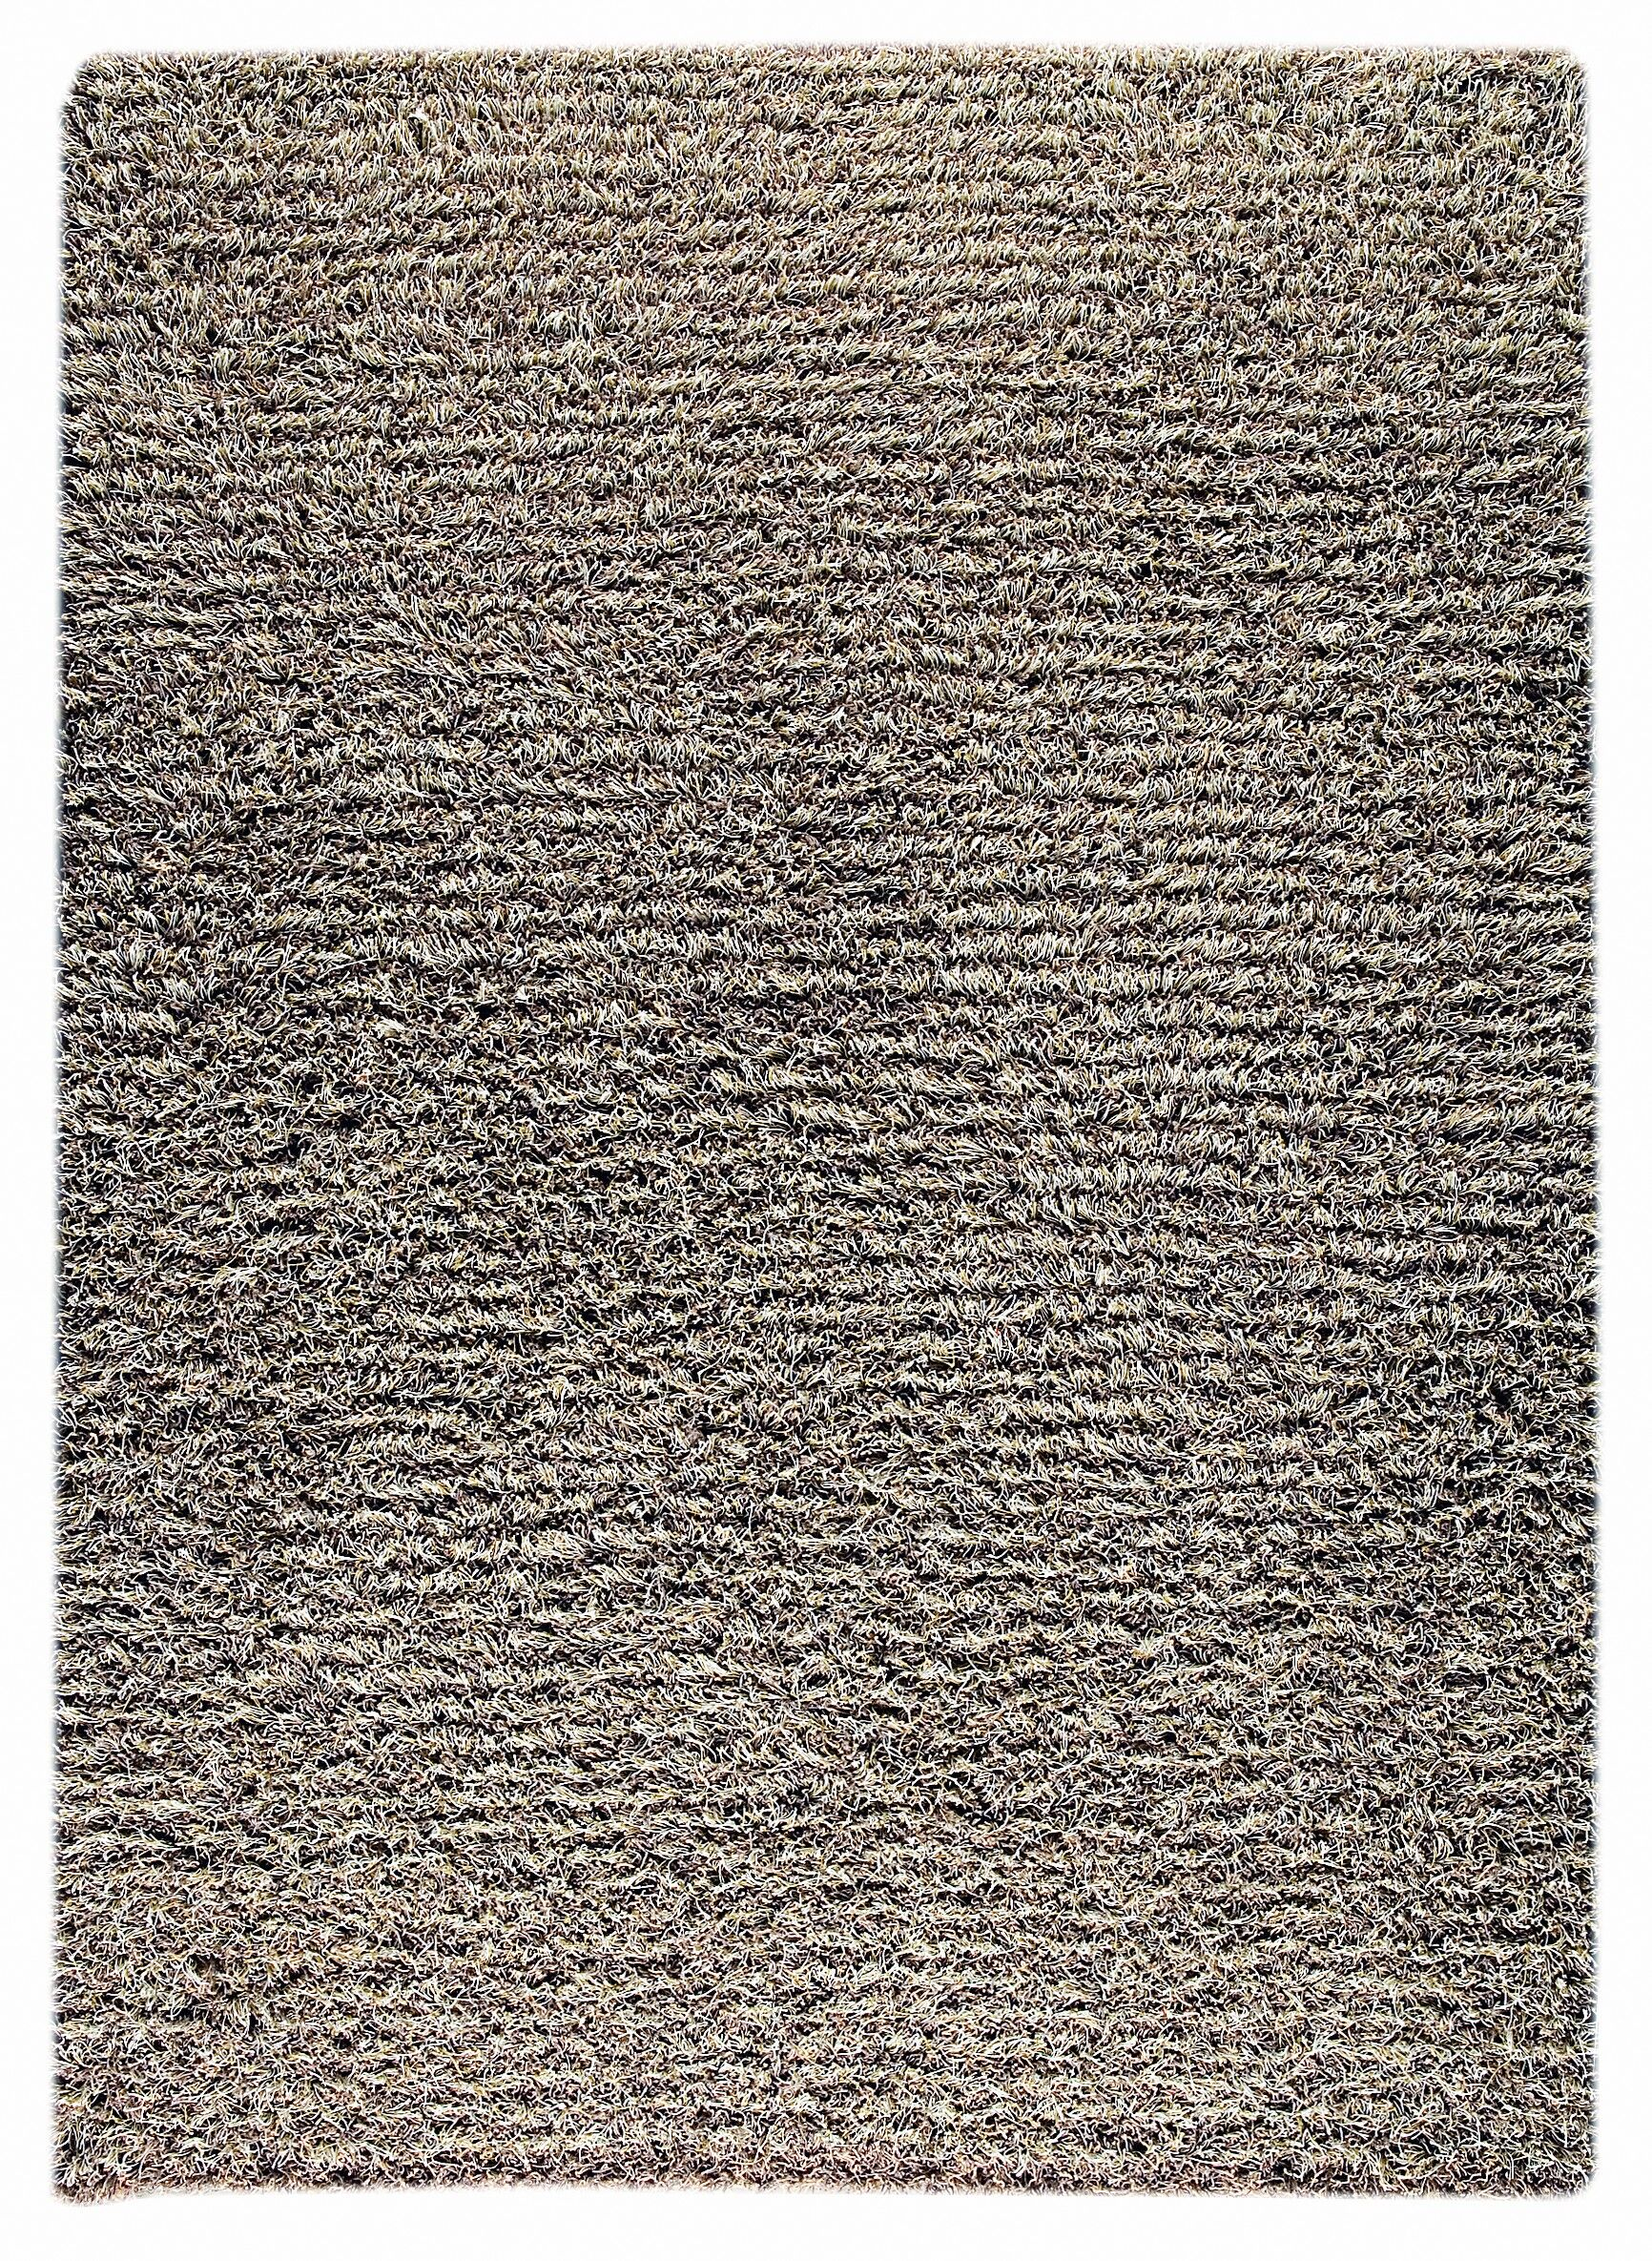 Cedarville knotted Grey/Beige Area Rug Rug Size: 5'6